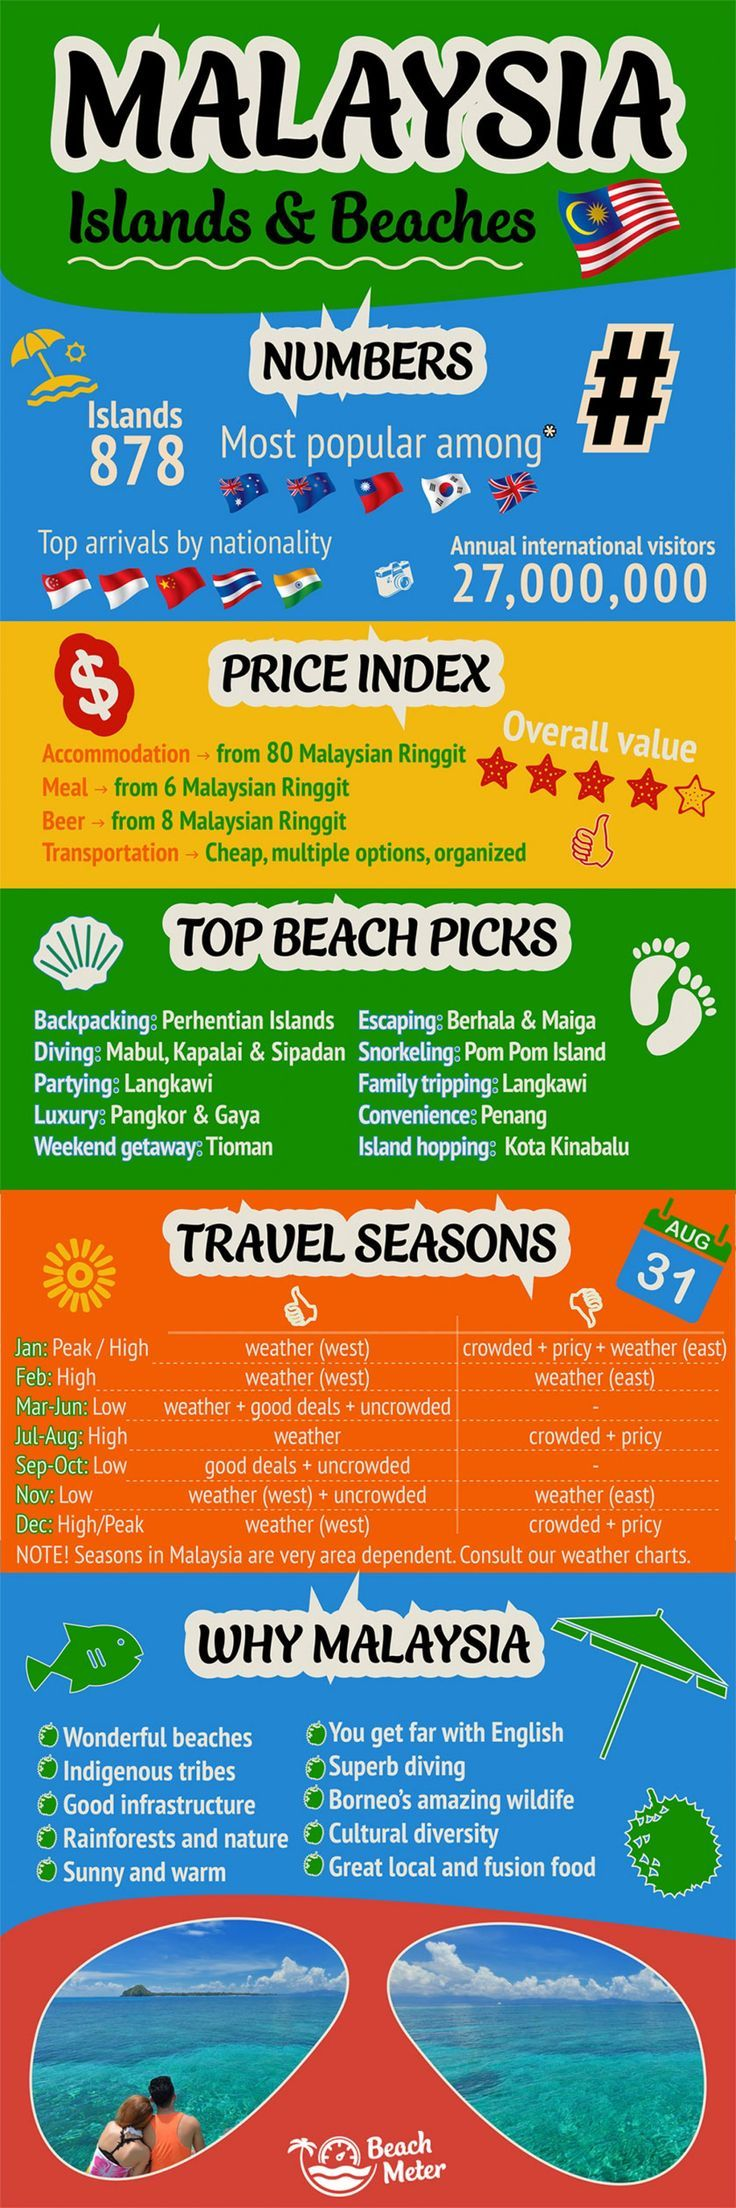 Malaysia borneo travel guide infographic digital